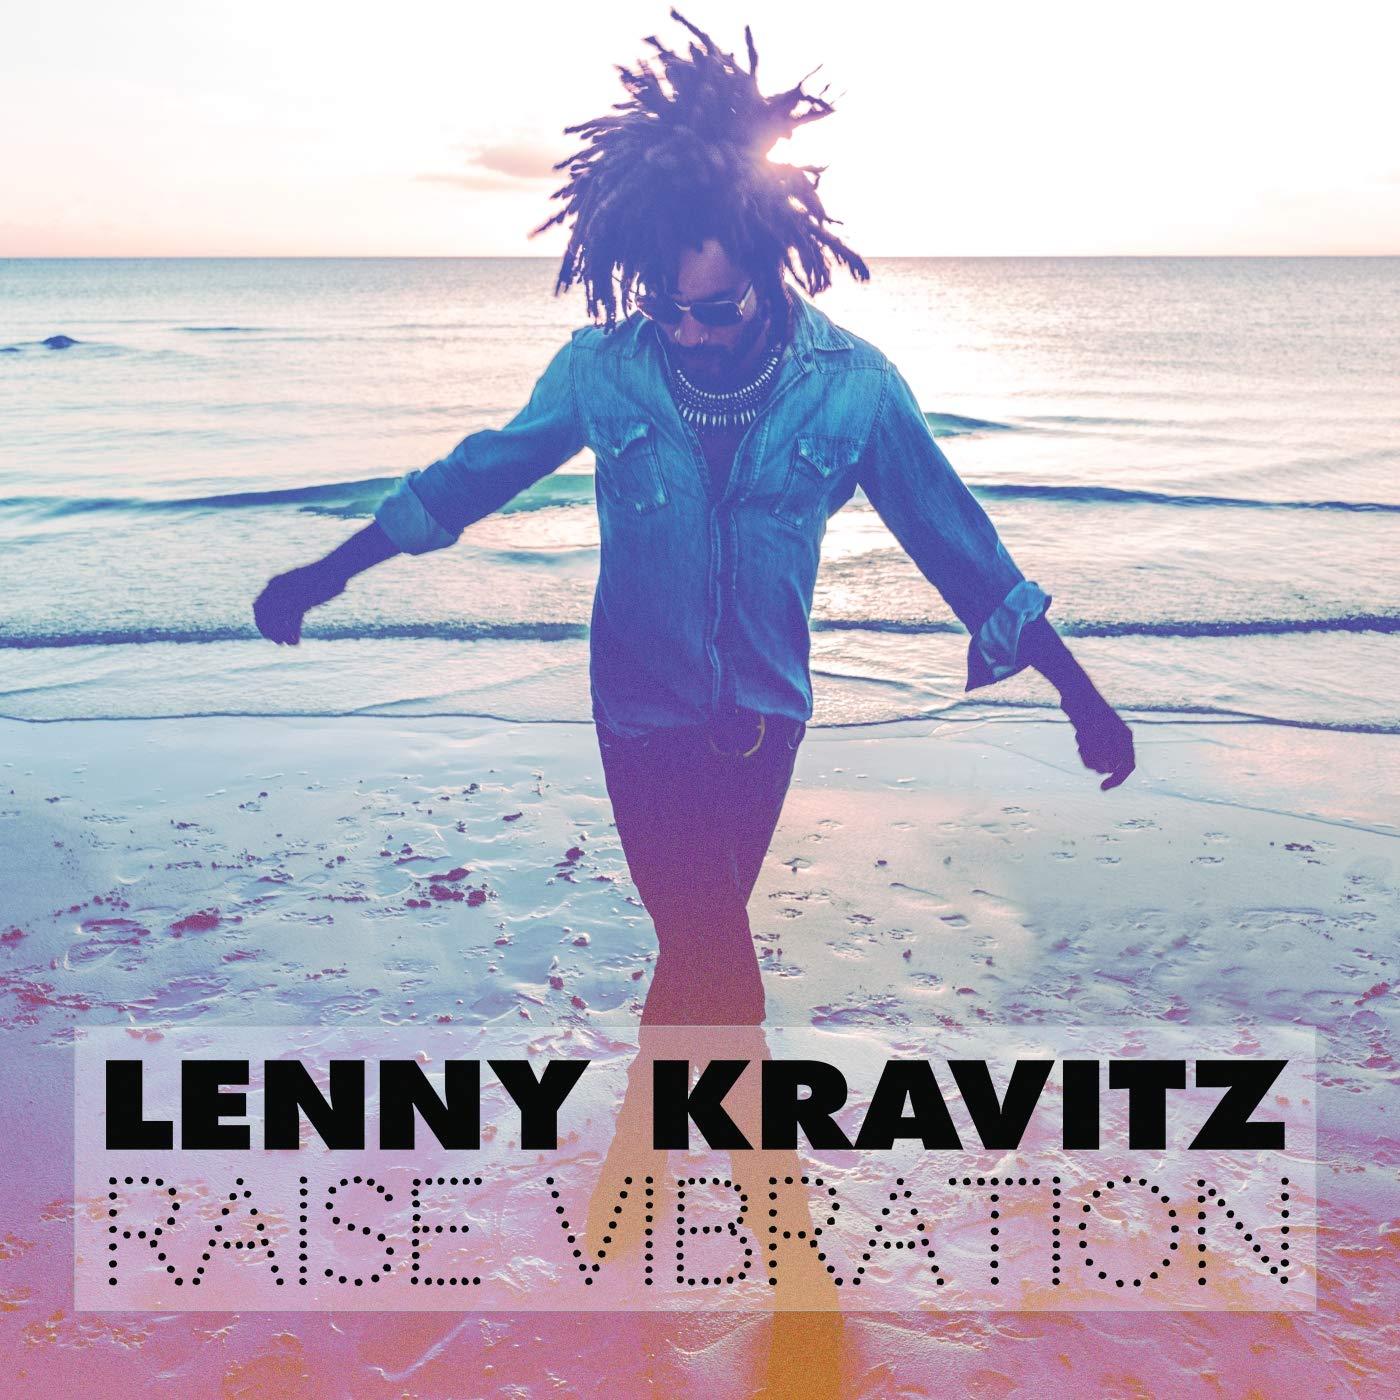 Lenny Kravitz Rise Vibration album cover